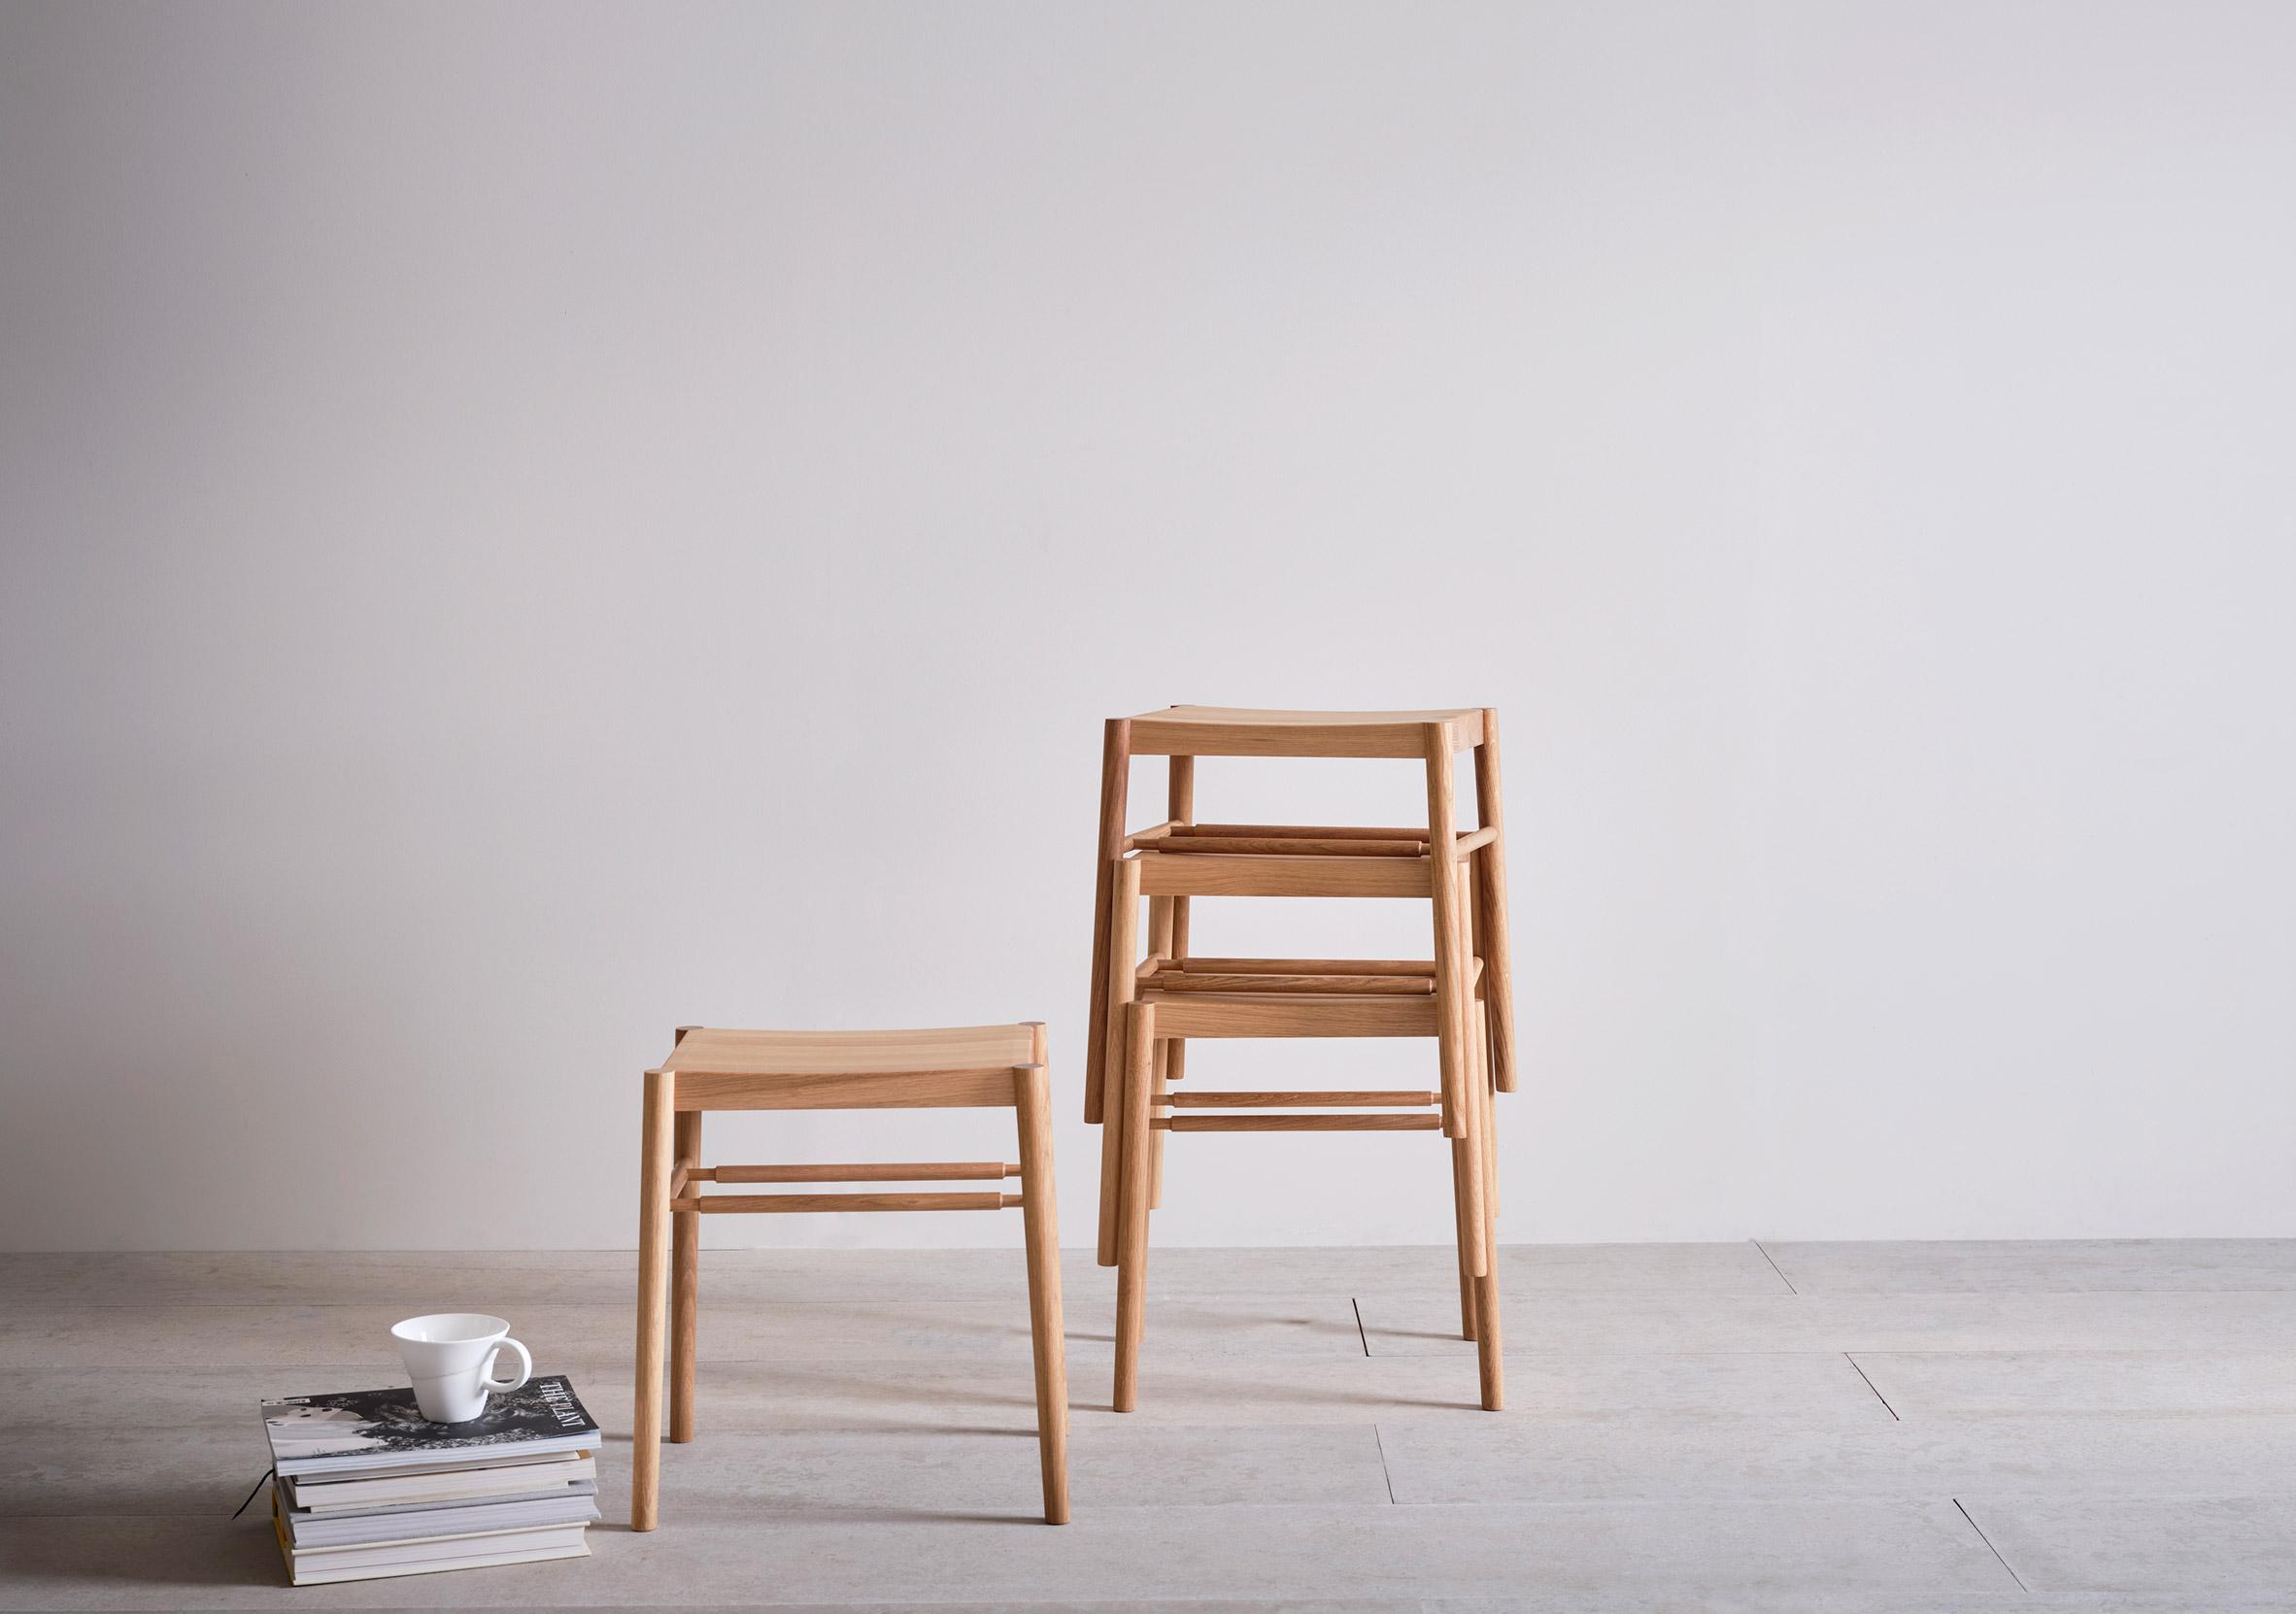 Astonishing Pinchs Latest Designs Express A Restrained Interpretation Uwap Interior Chair Design Uwaporg